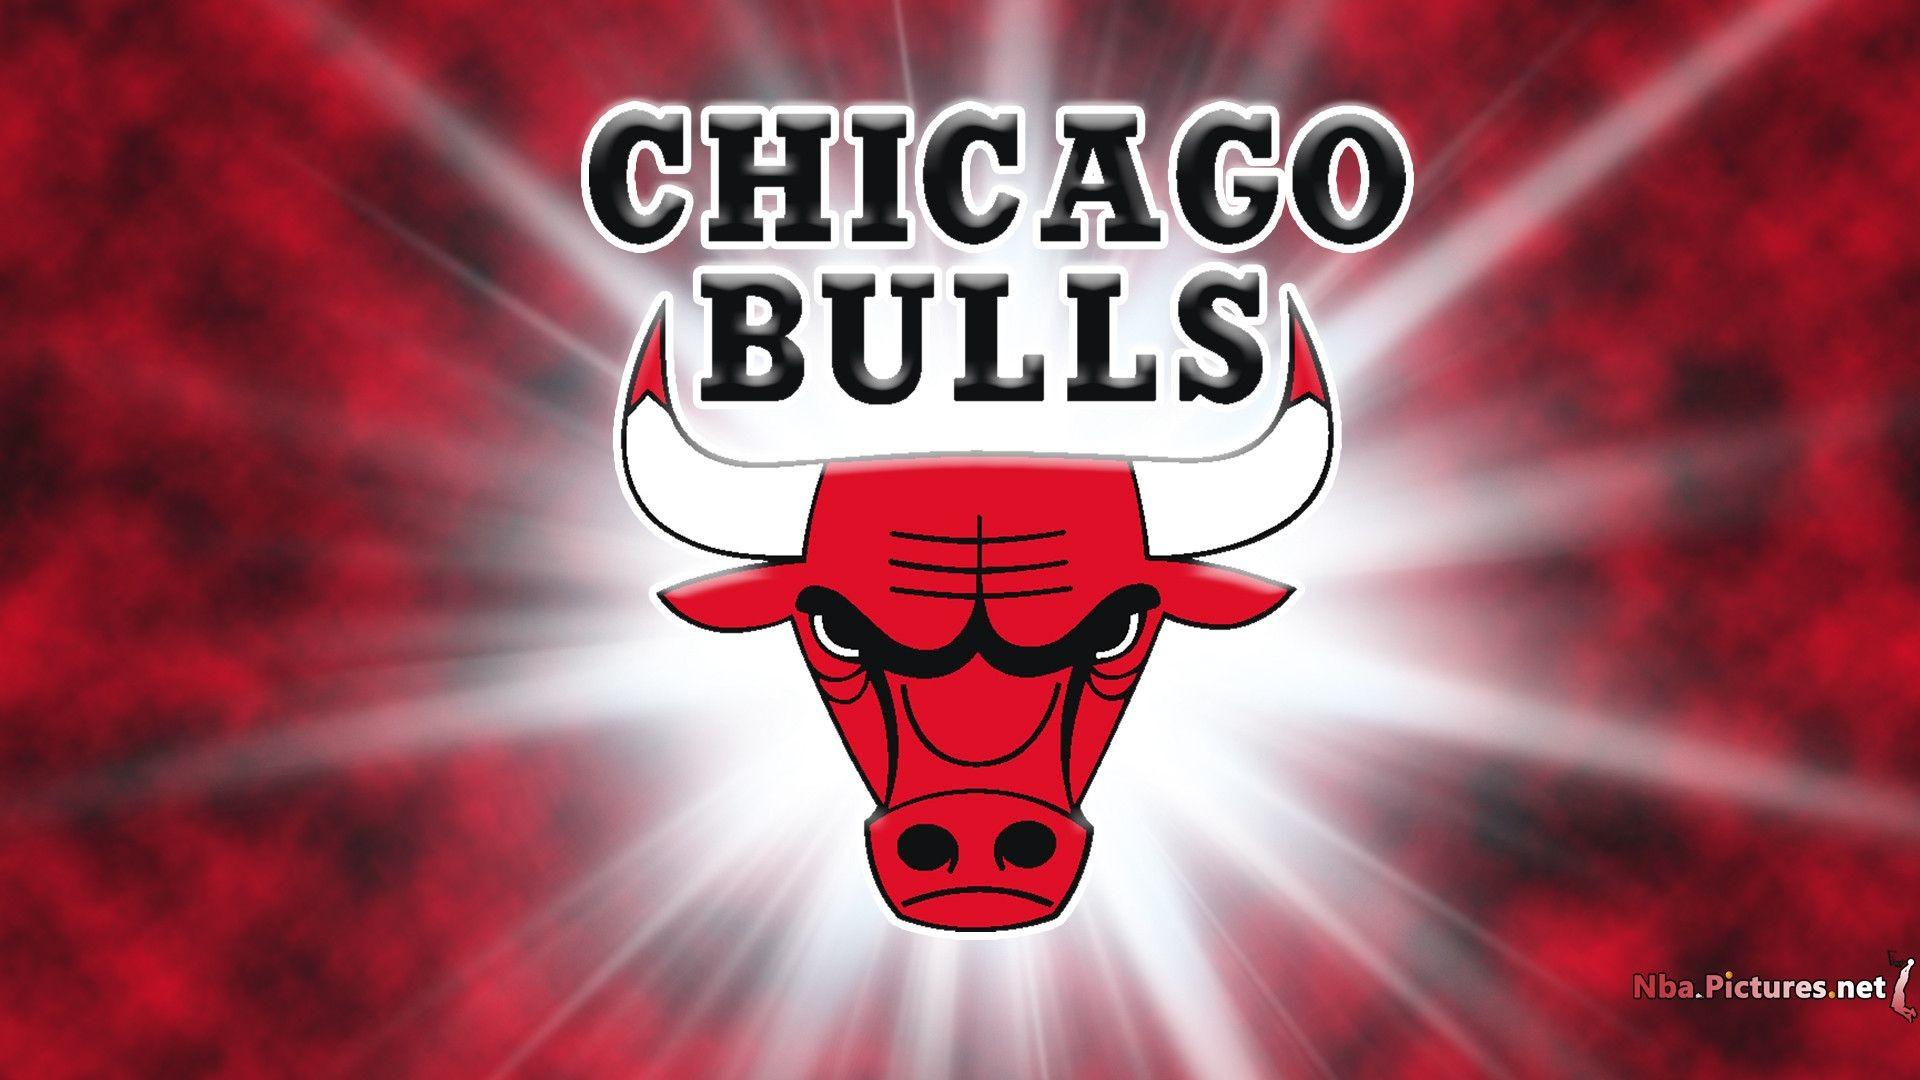 Chicago Bulls D Wallpapers Wallpaper